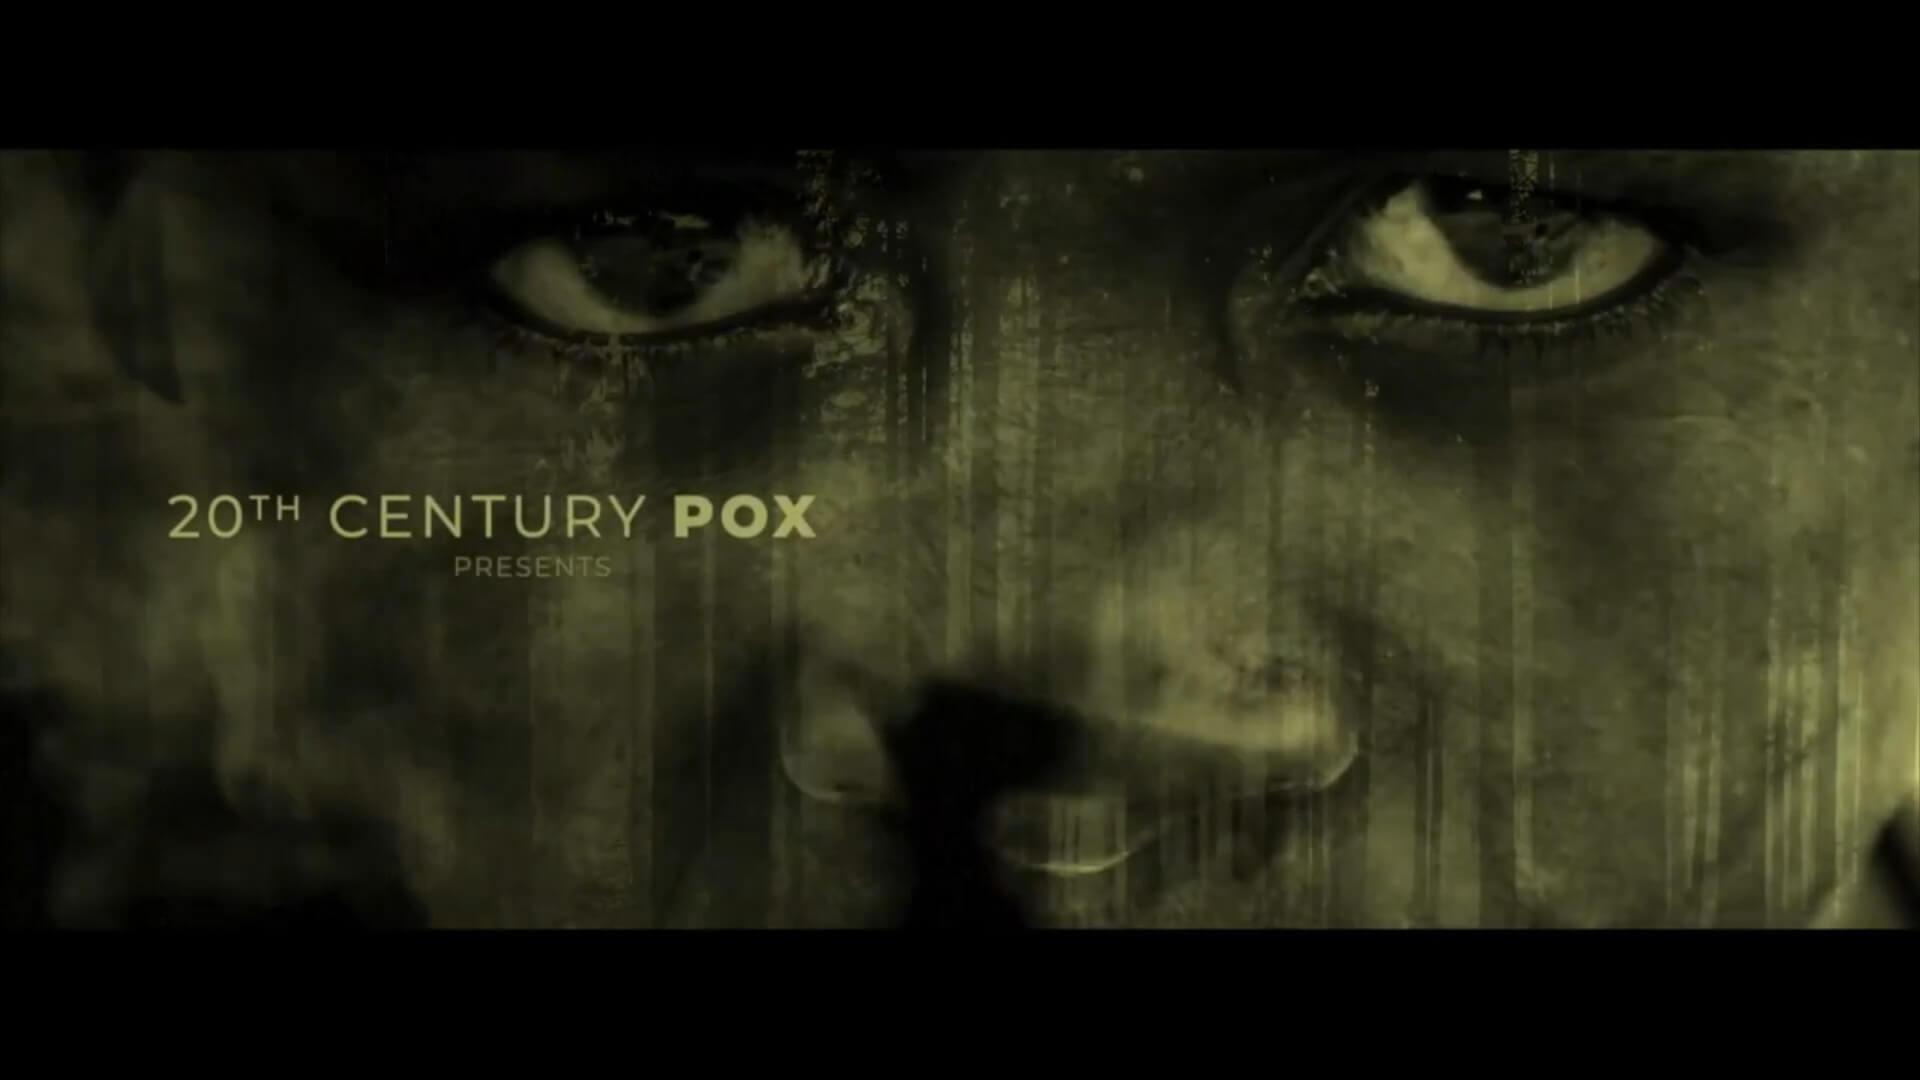 fcpx插件 双重曝光烟雾特效影片开场片头模板 Opening Titles